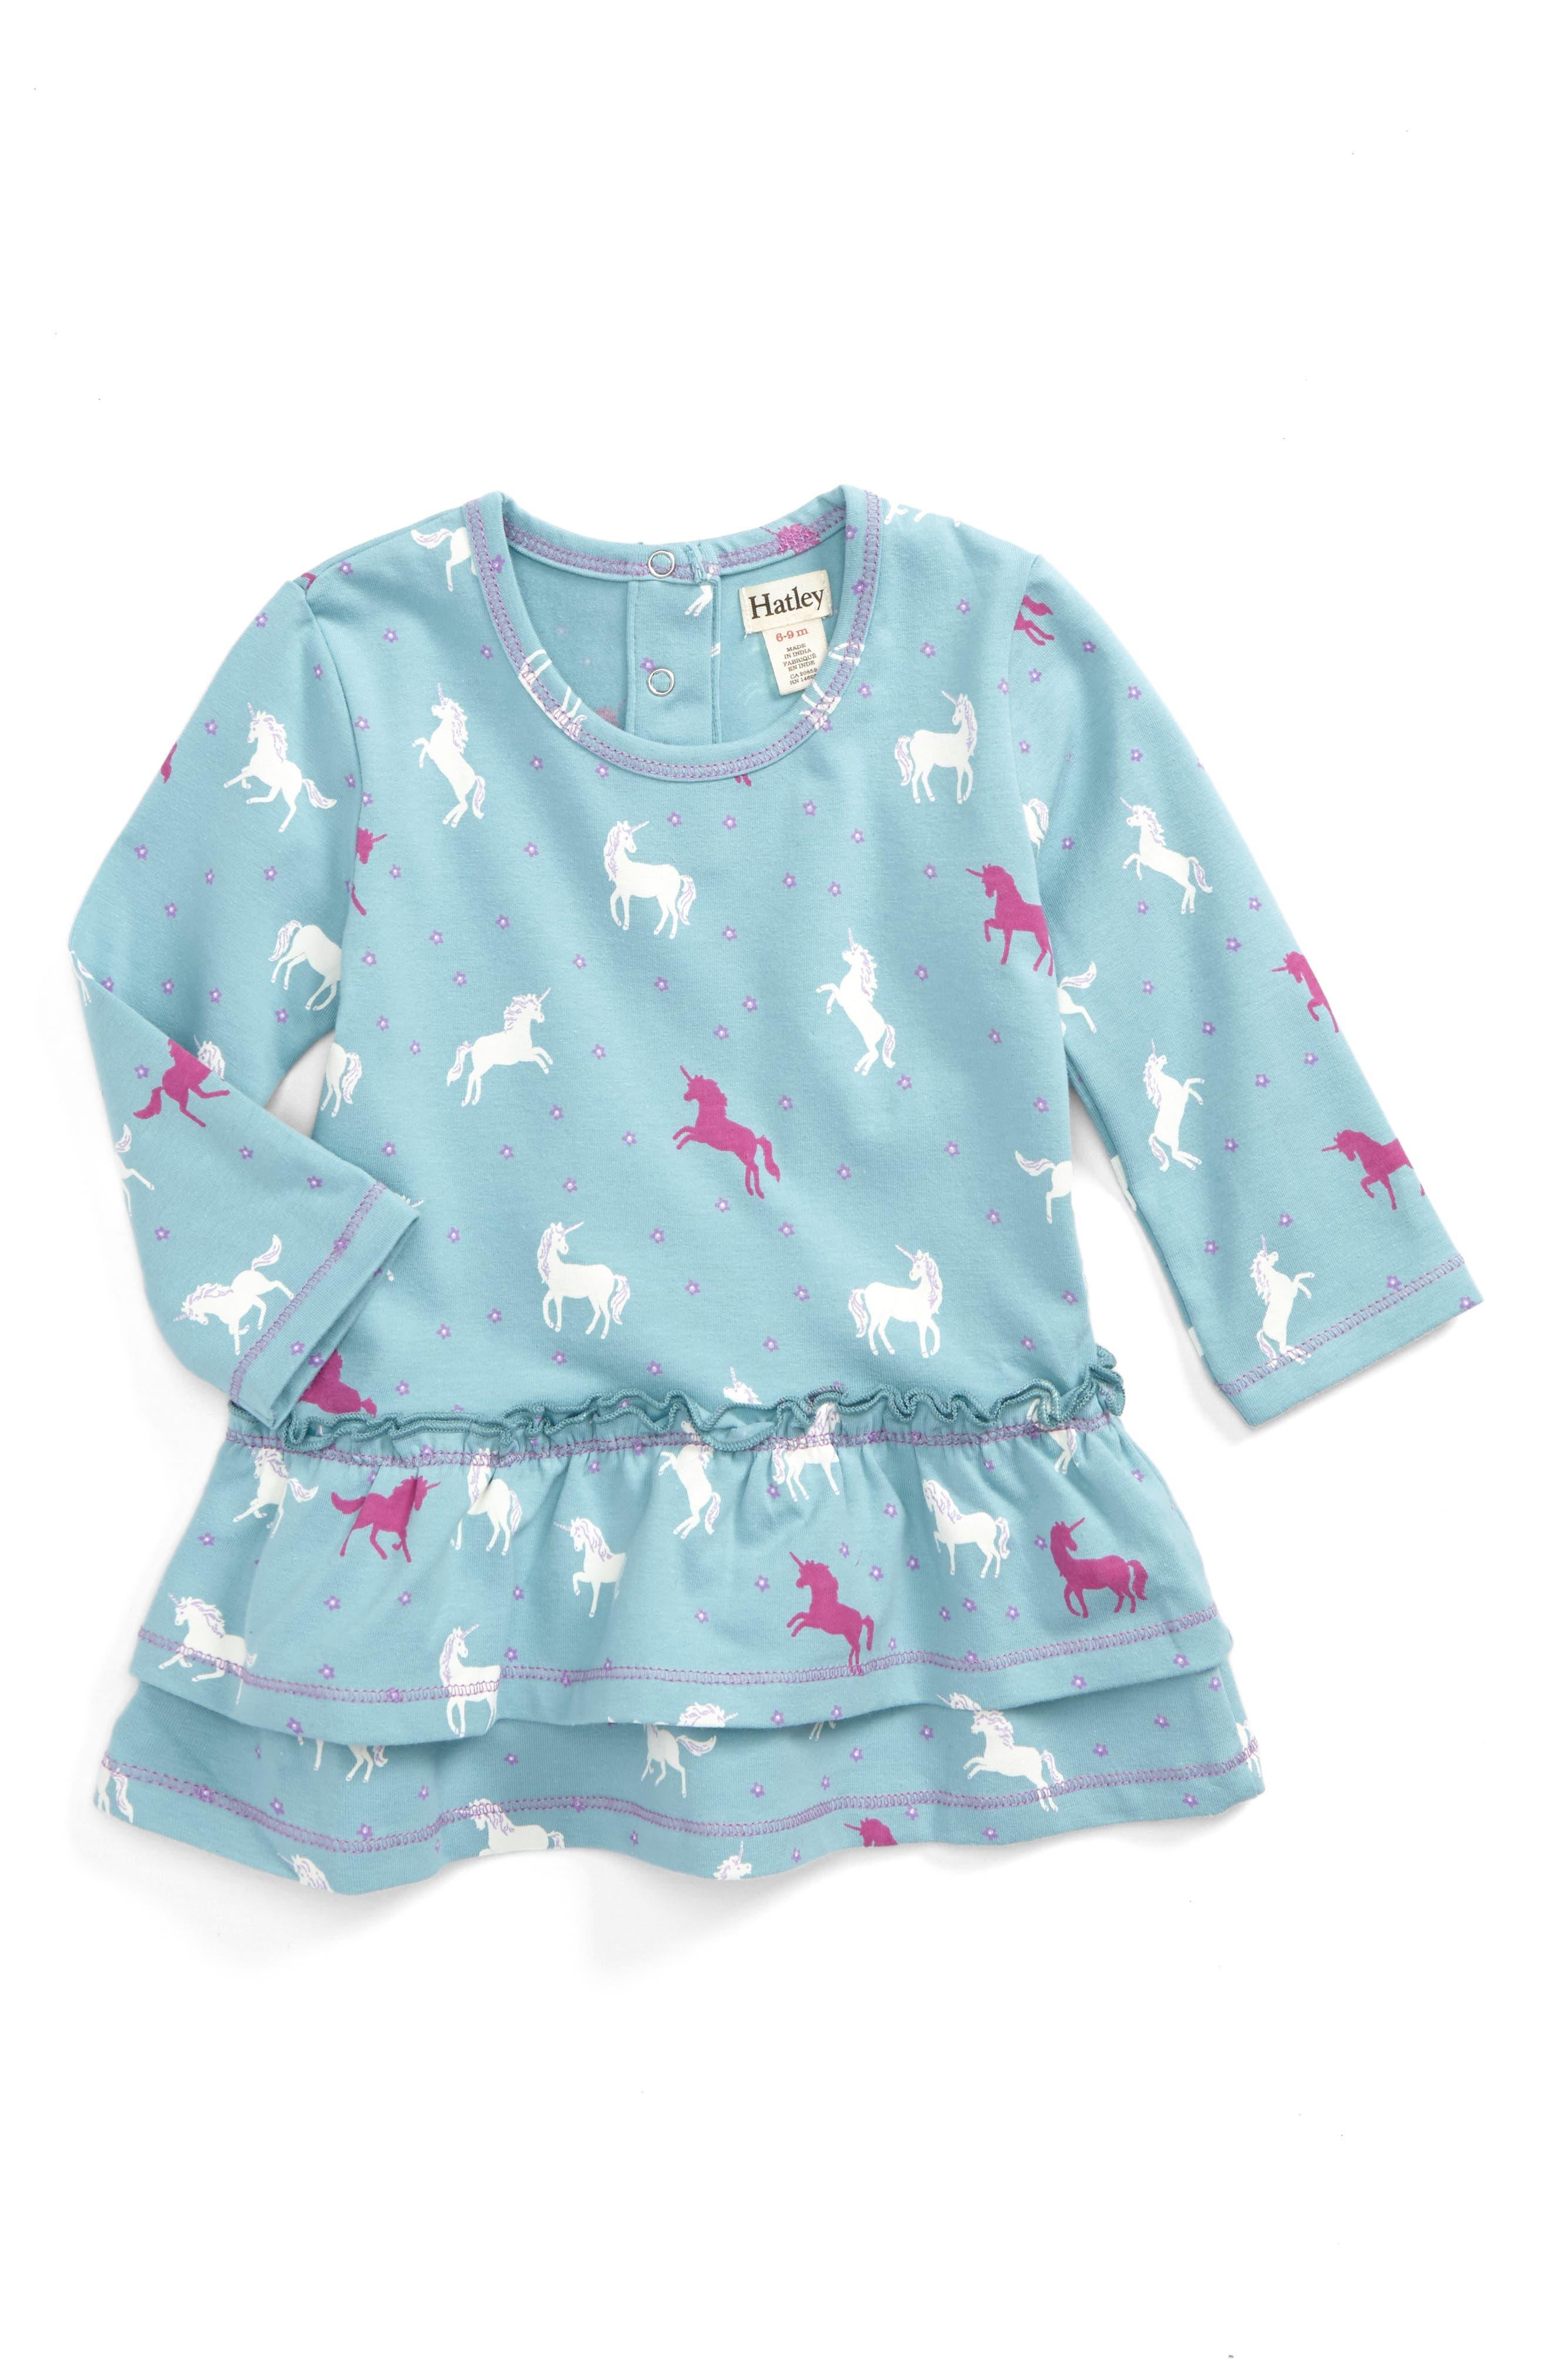 Main Image - Hatley Print Layered Dress (Baby Girls)